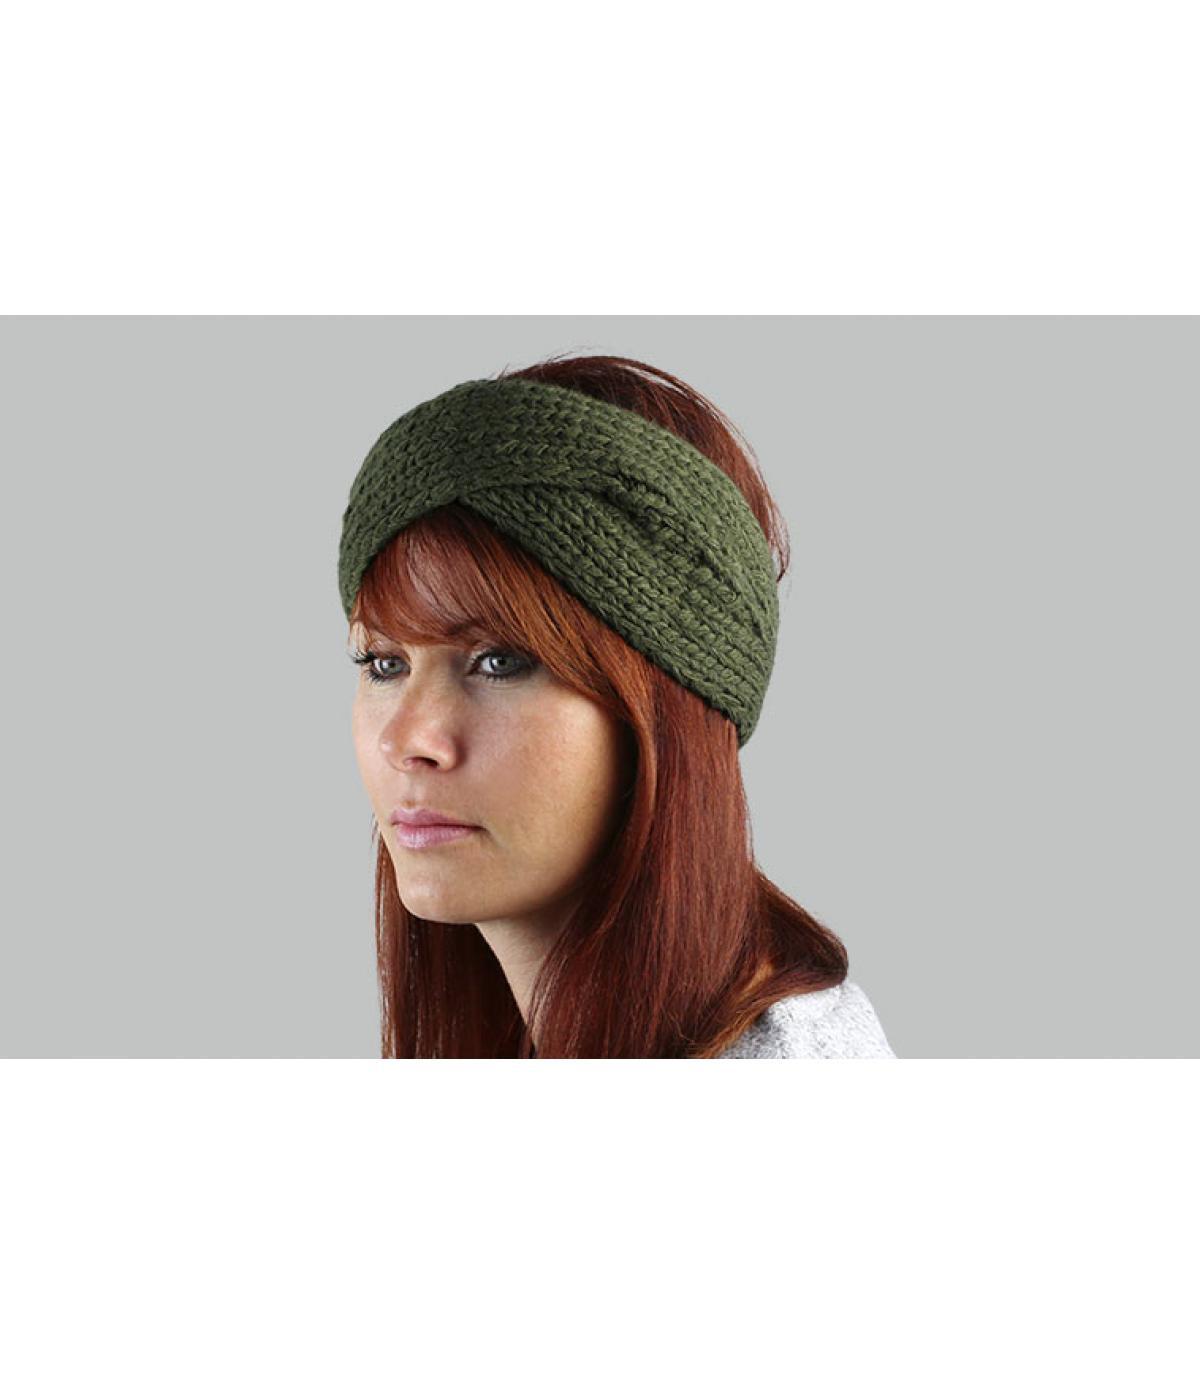 groene gekruiste hoofdband